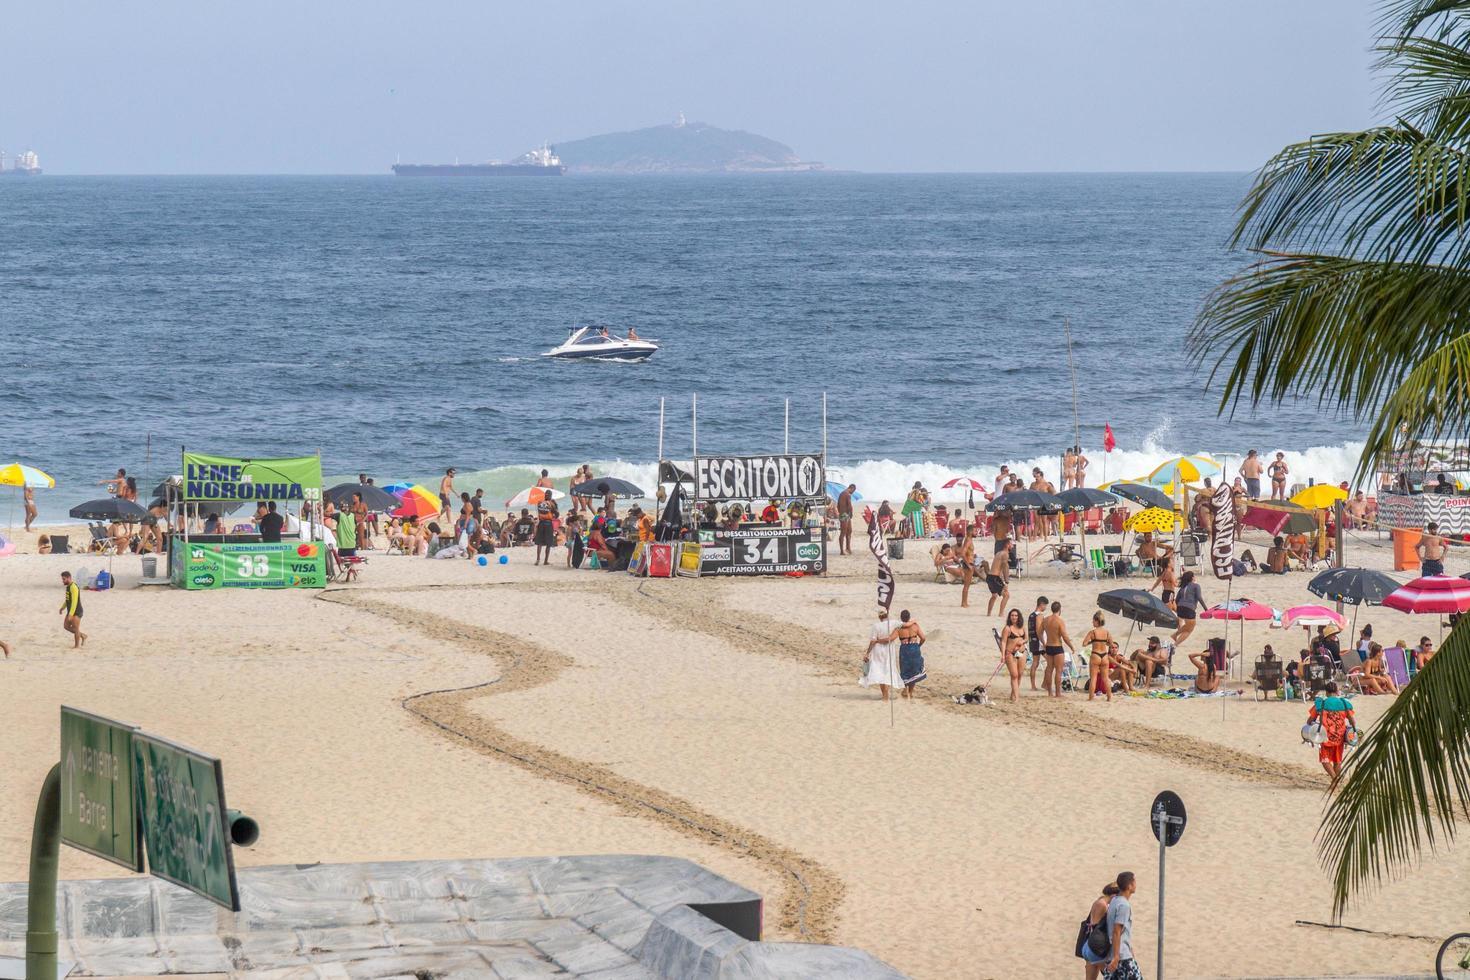 río de janeiro, brasil, 2015 - playa leme en copacabana foto